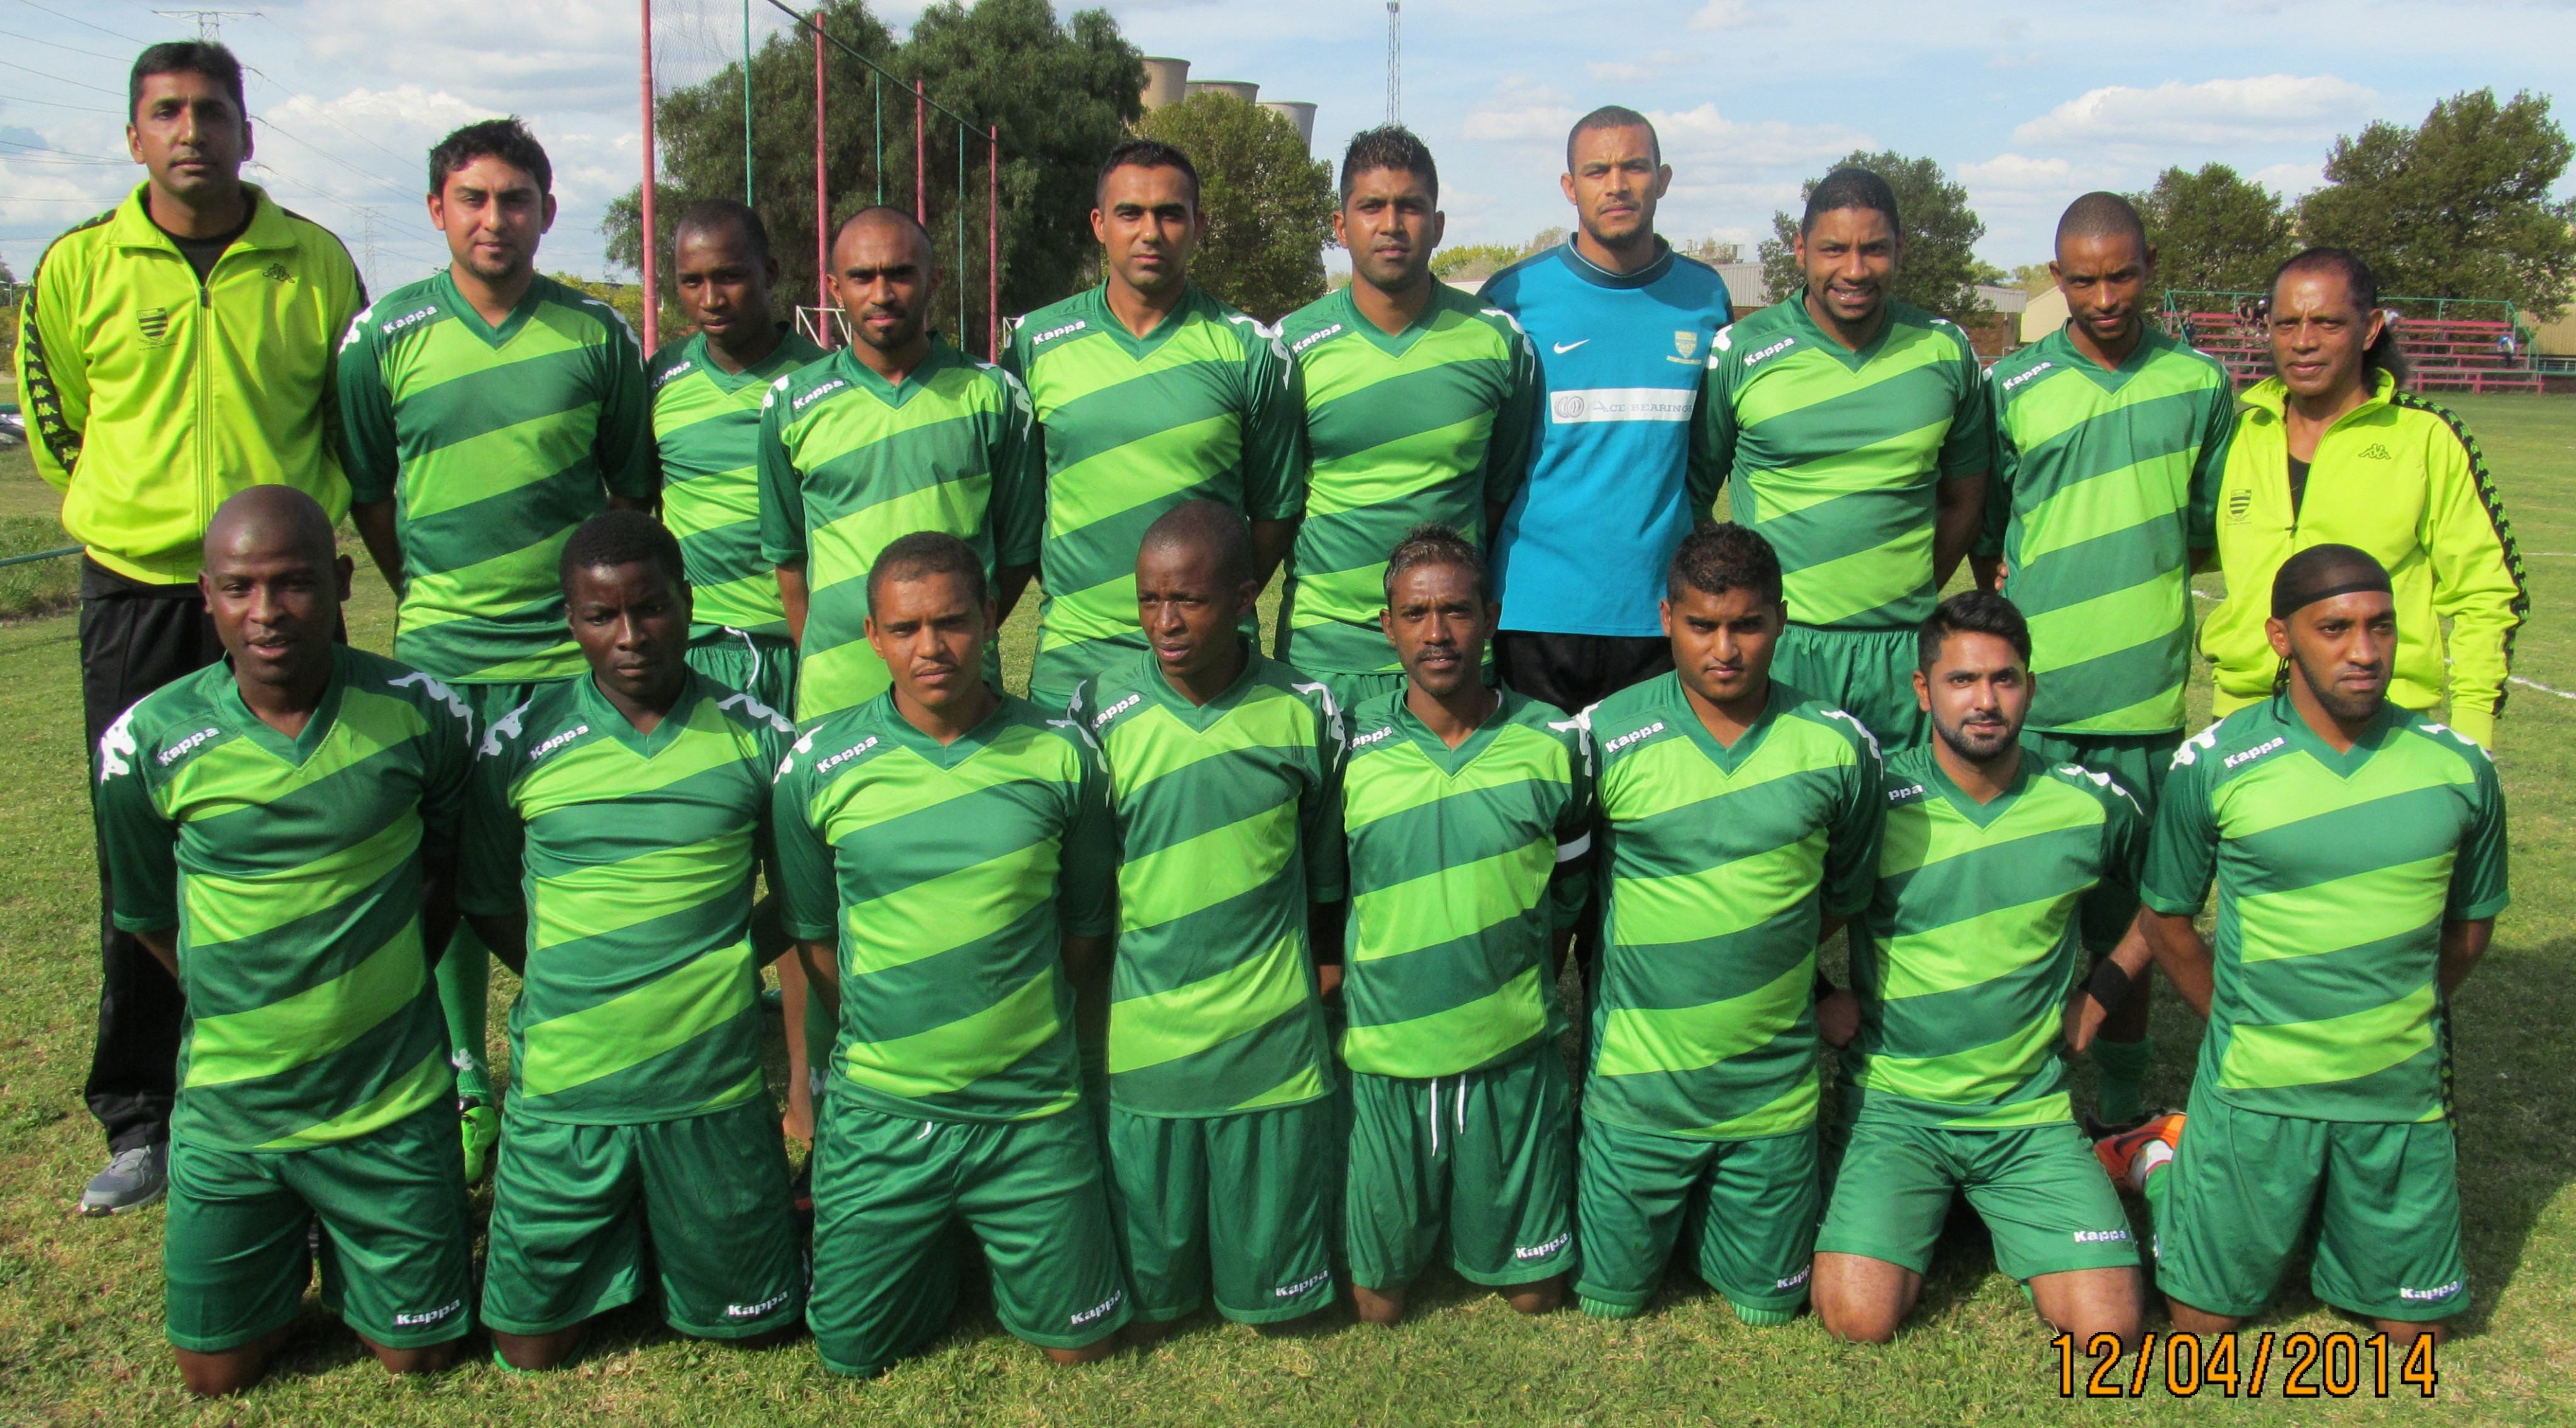 delfos-1st-team-2014